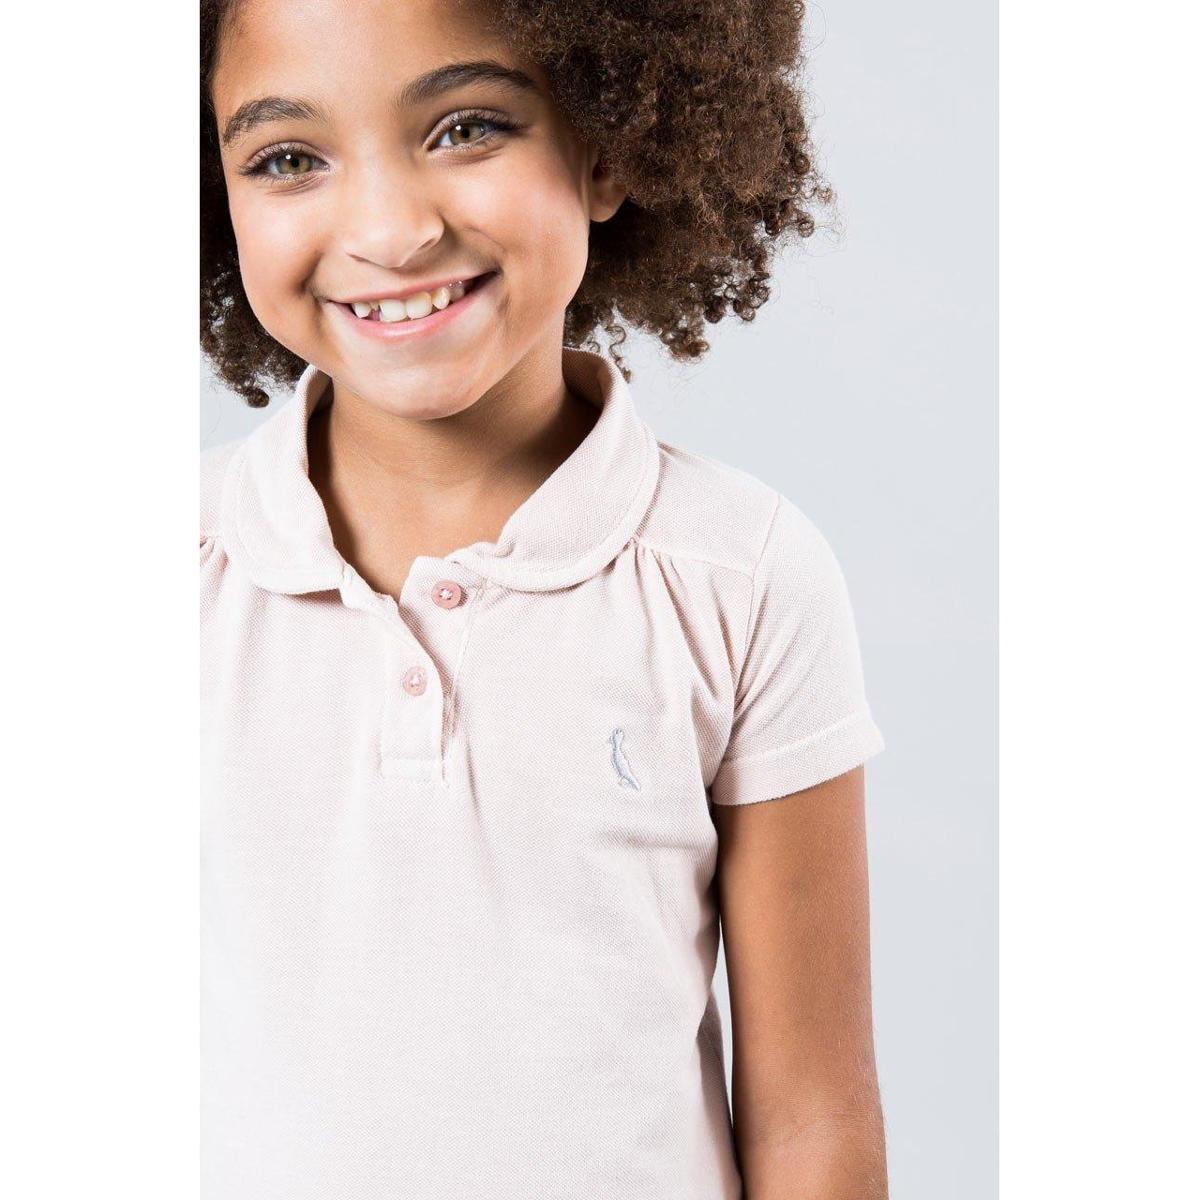 556679aa6b Camisa Polo Infantil Reserva Mini Feminina - Off White - Compre ...